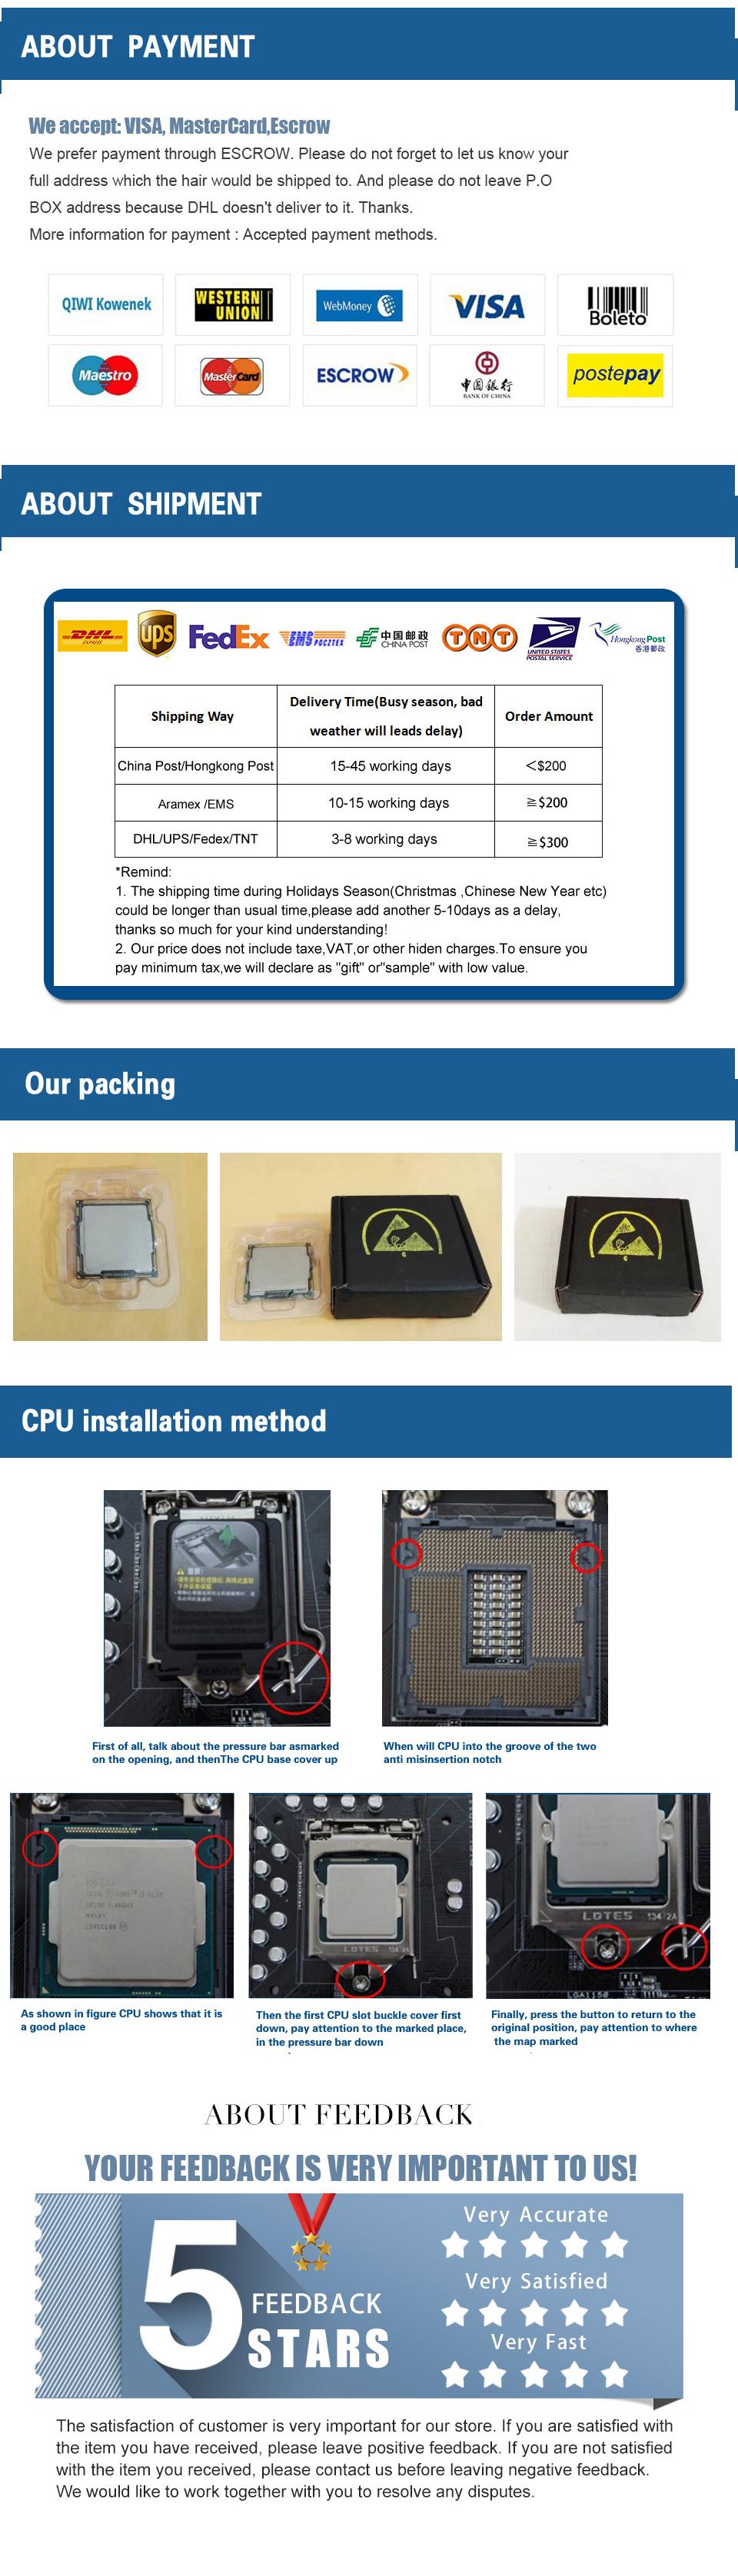 CPU 2